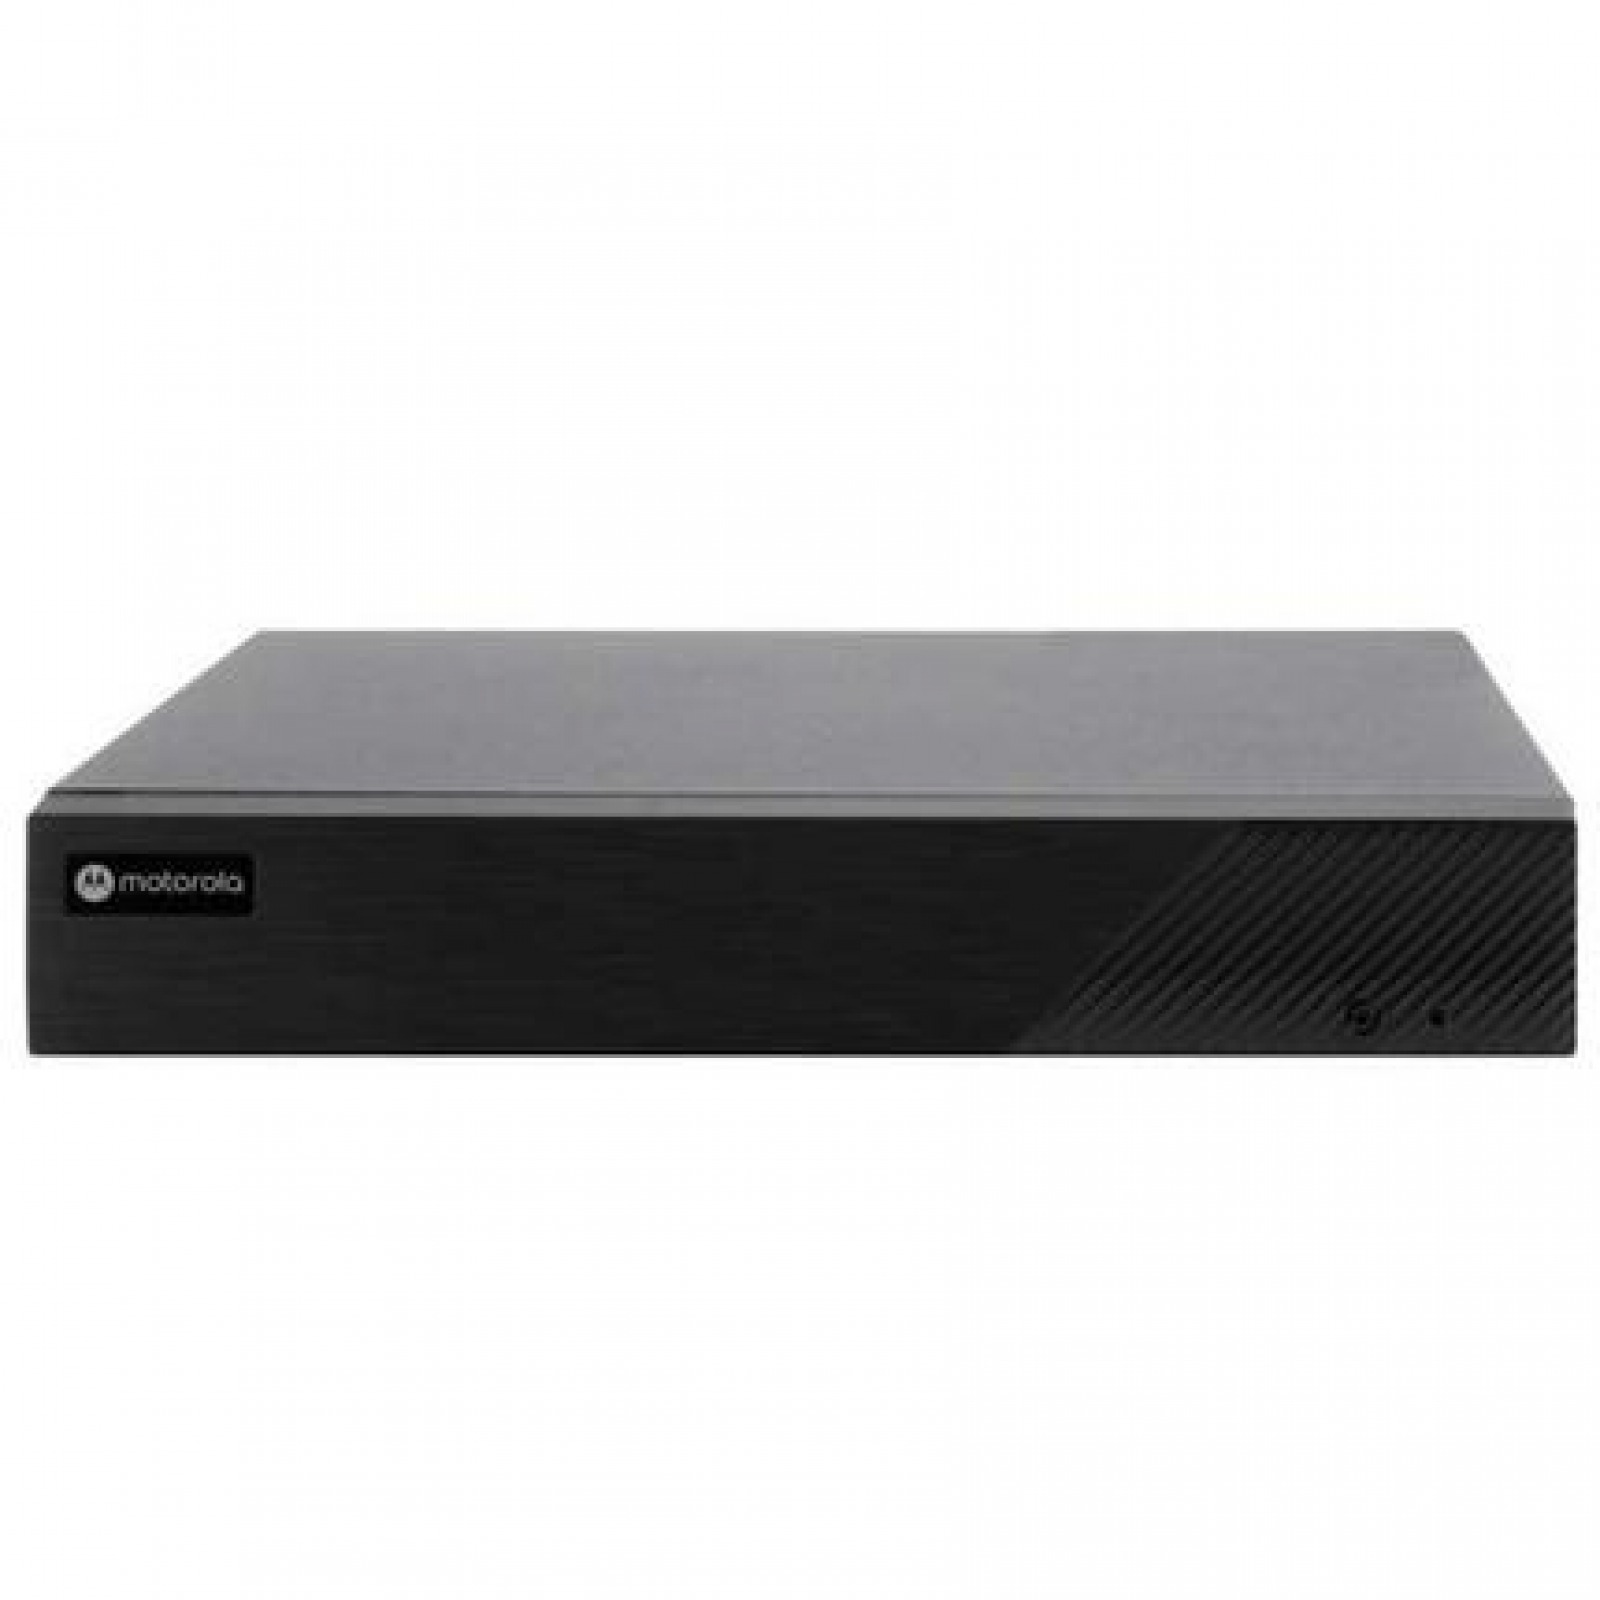 DVR FULL HD 8 CANAIS MOTOROLA MTD081F0011